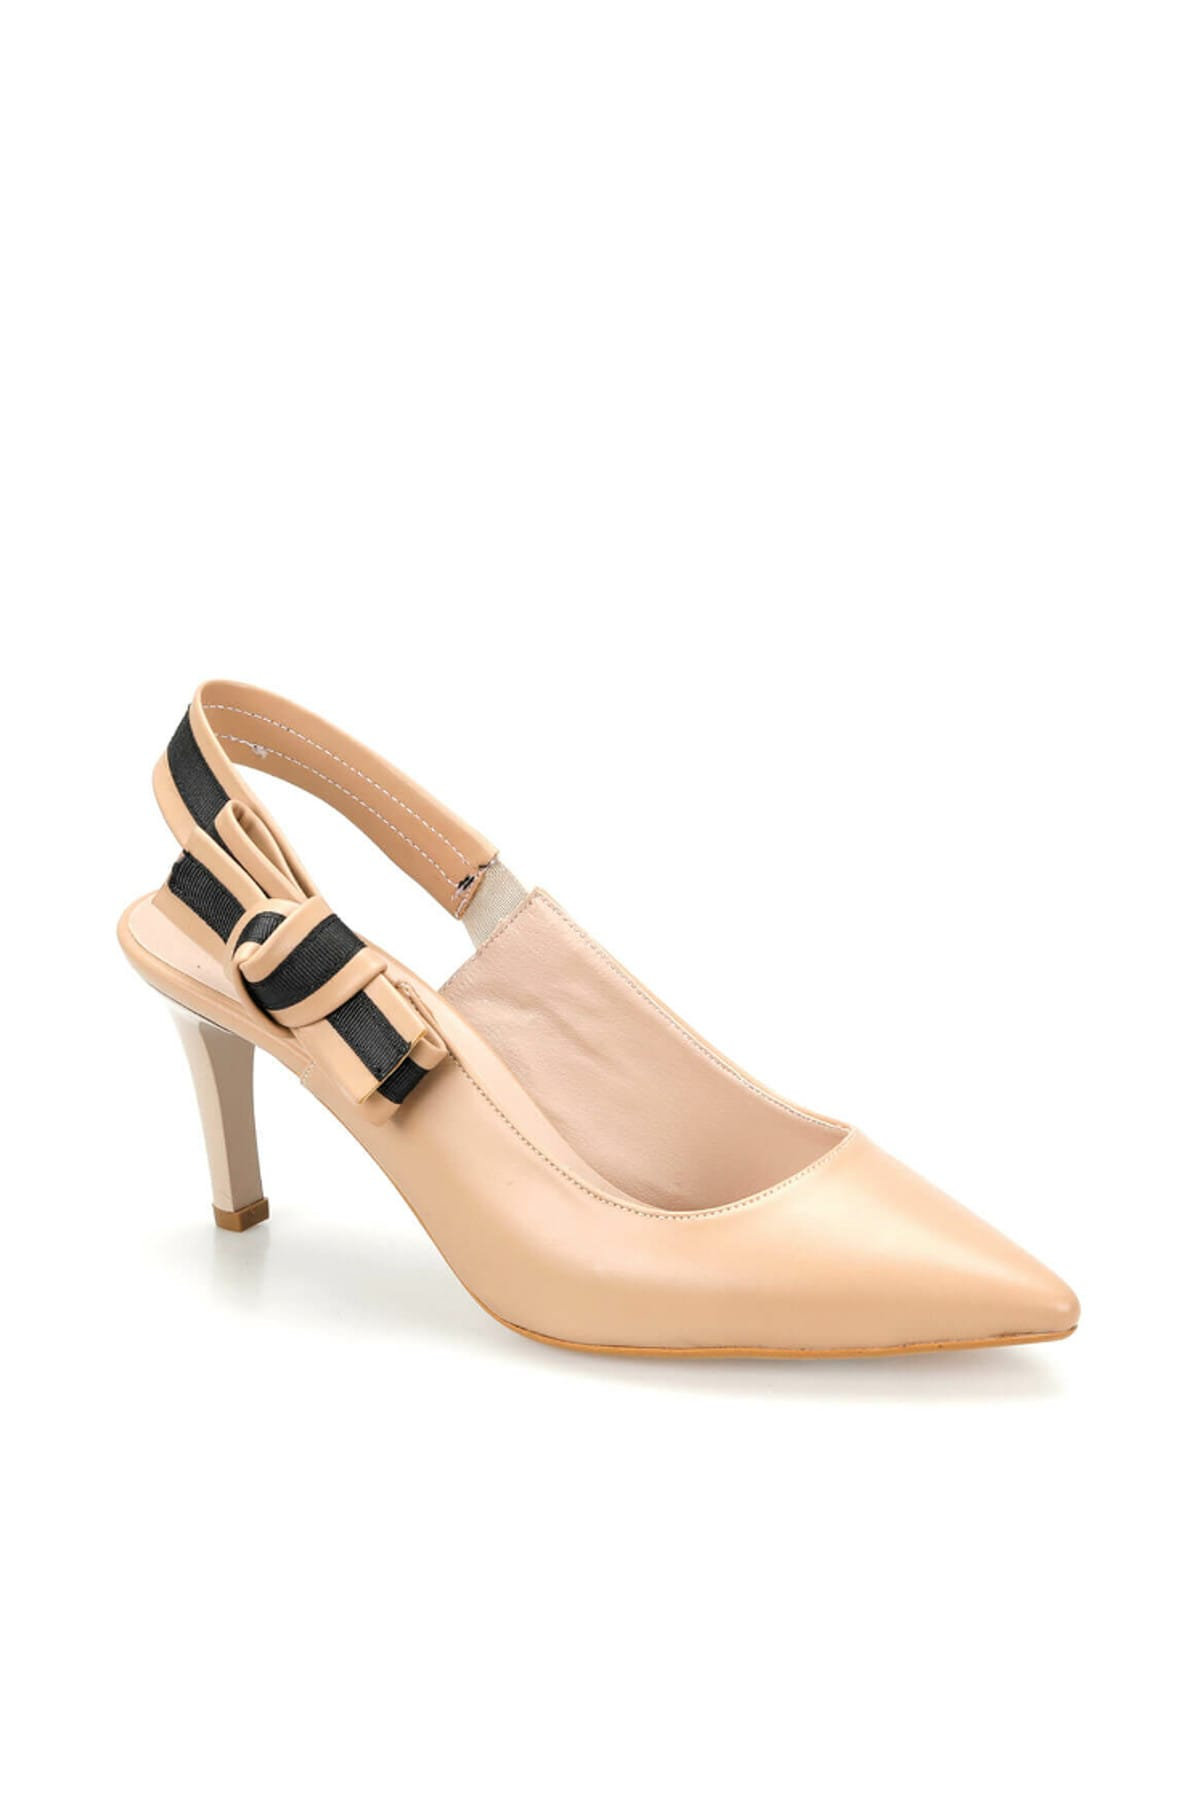 Miss F Ds19074 Bej Kadın Topuklu Ayakkabı 100382790 1